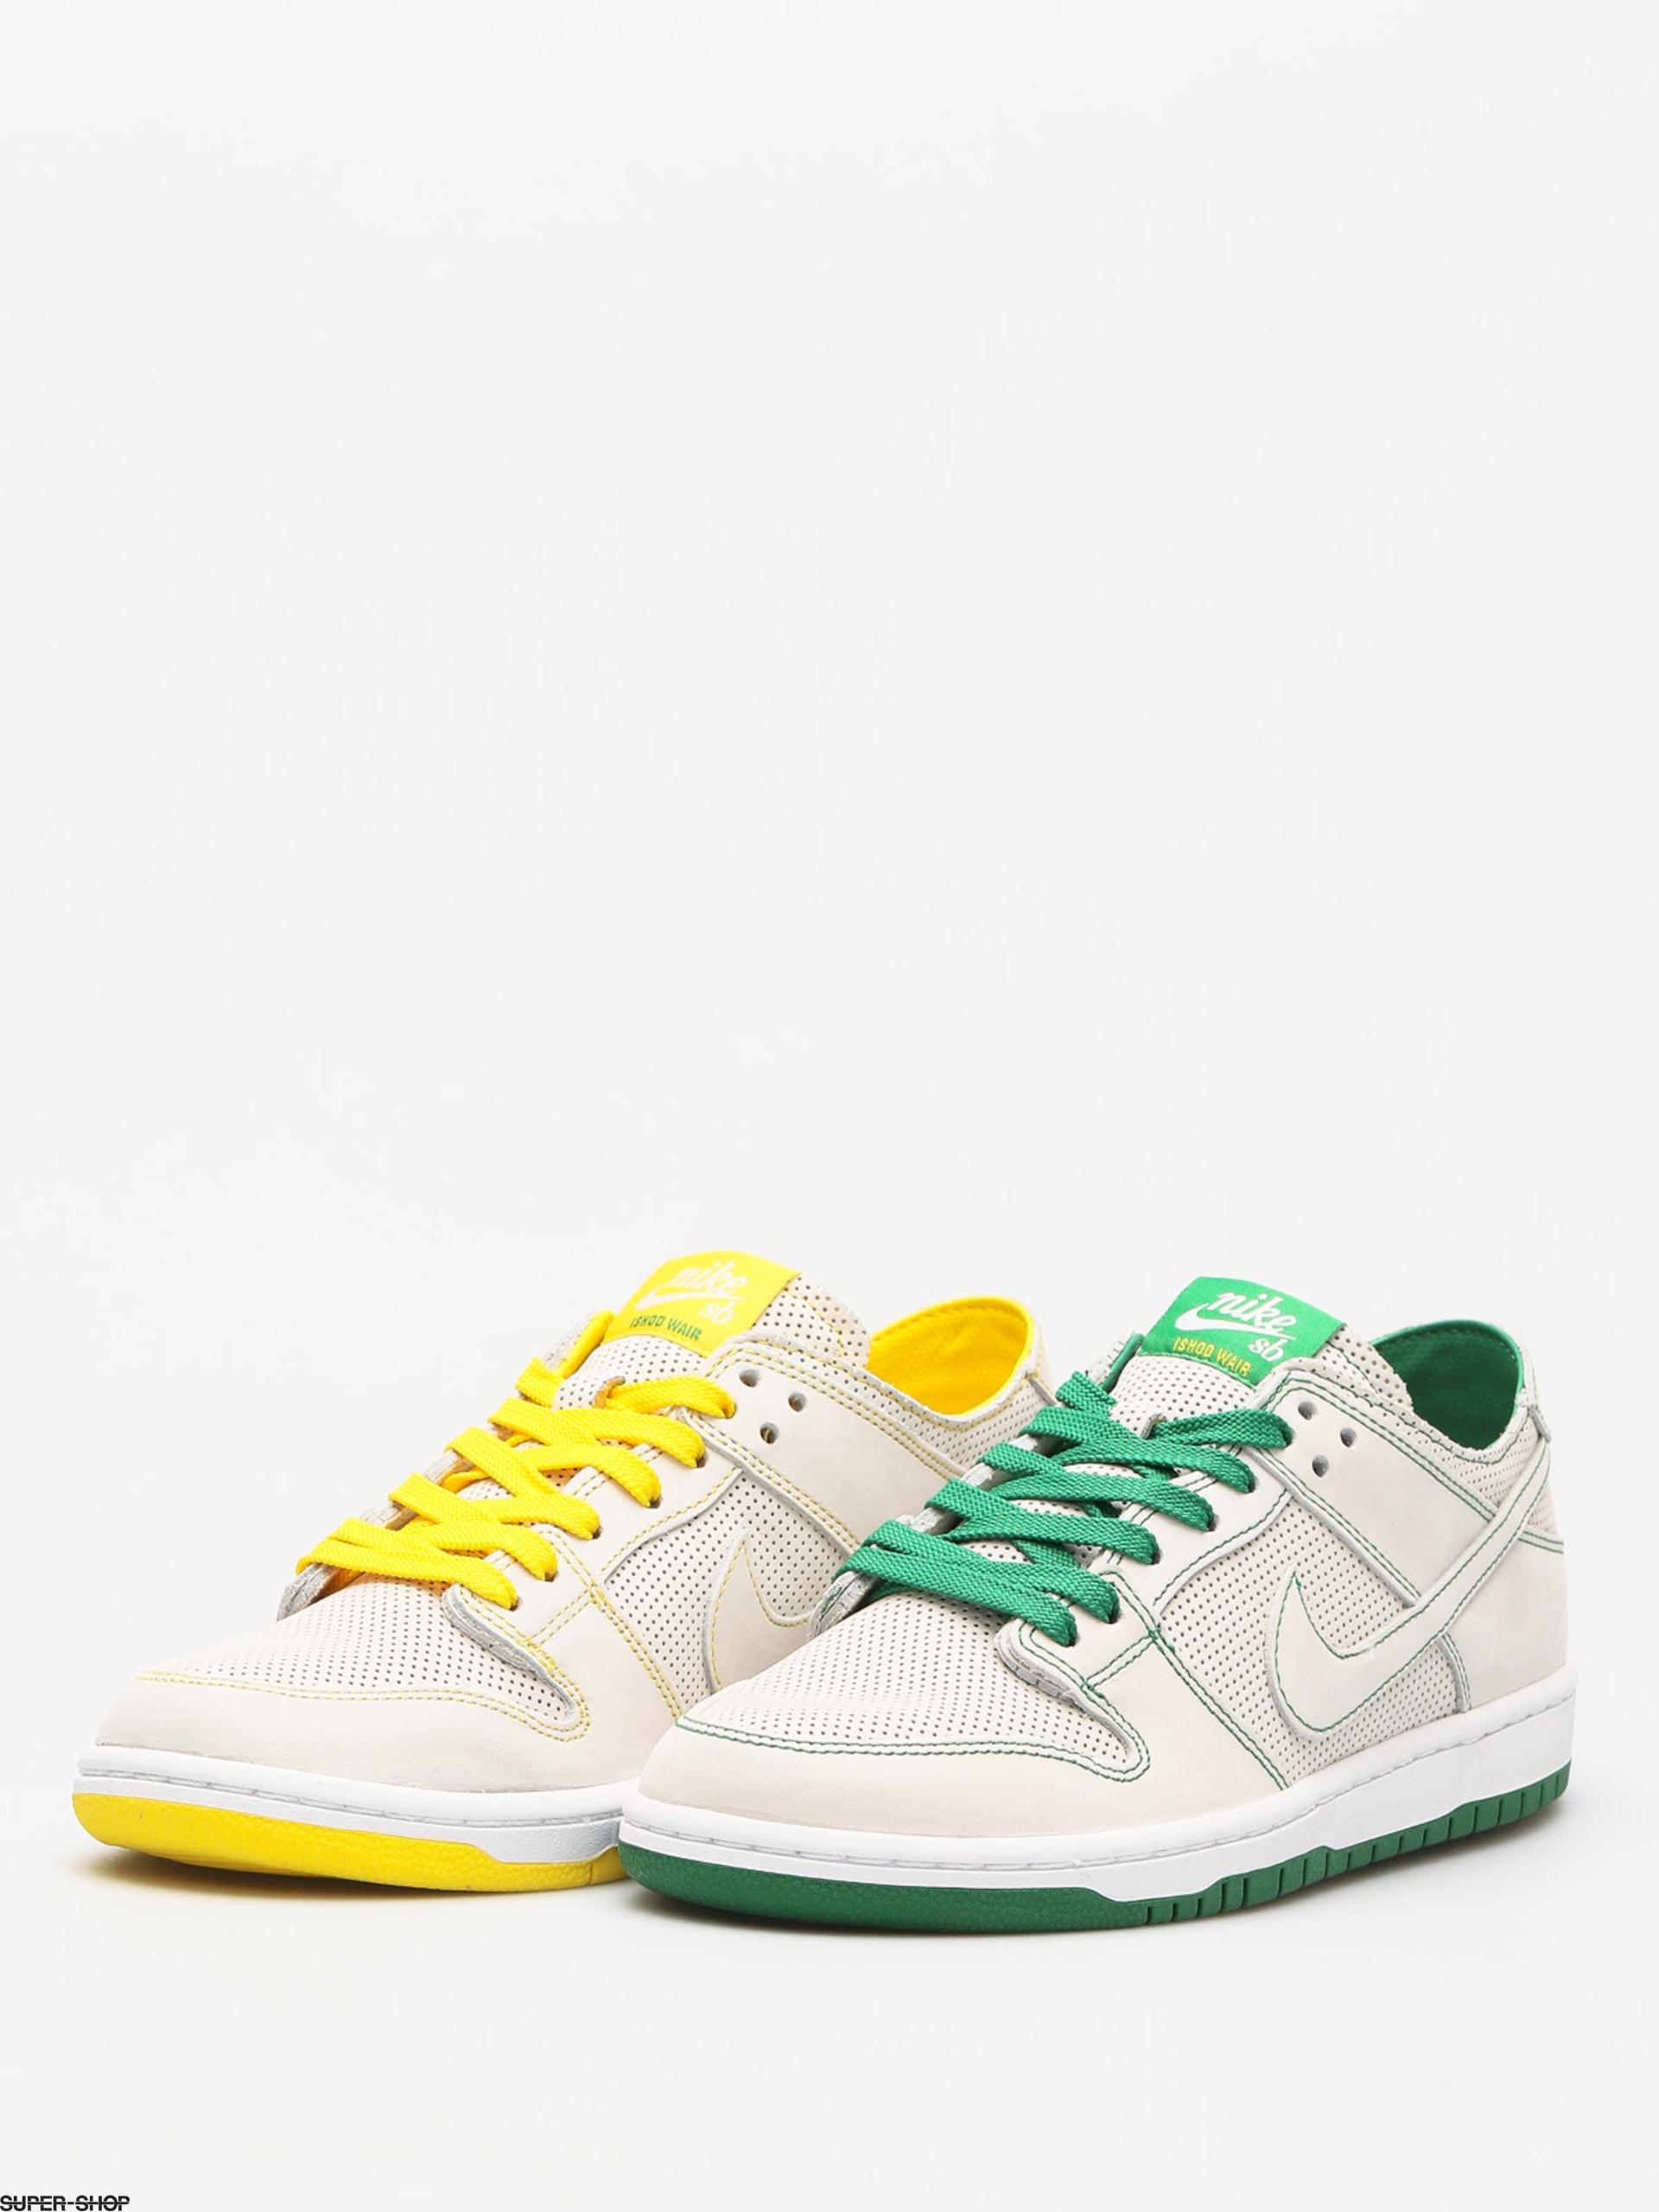 5e2d69190b1a ... france nike sb shoes sb zoom dunk low pro decon qs white white aloe  verde 11909